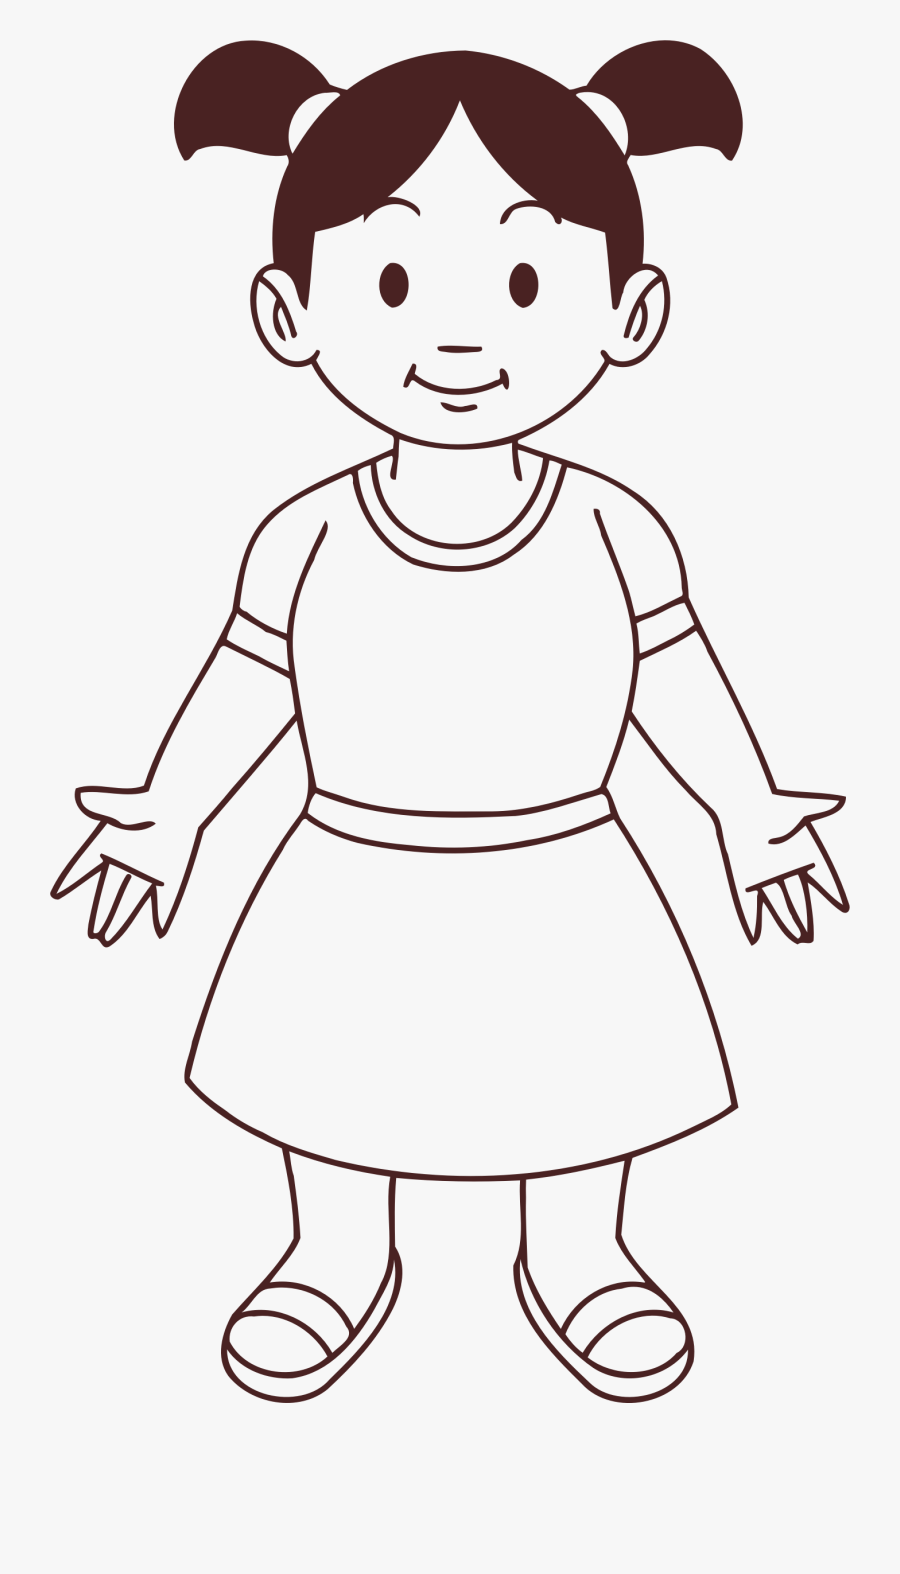 Kid Drawing Clipart : drawing, clipart, Clipart, Drawing, Transparent, ClipartKey